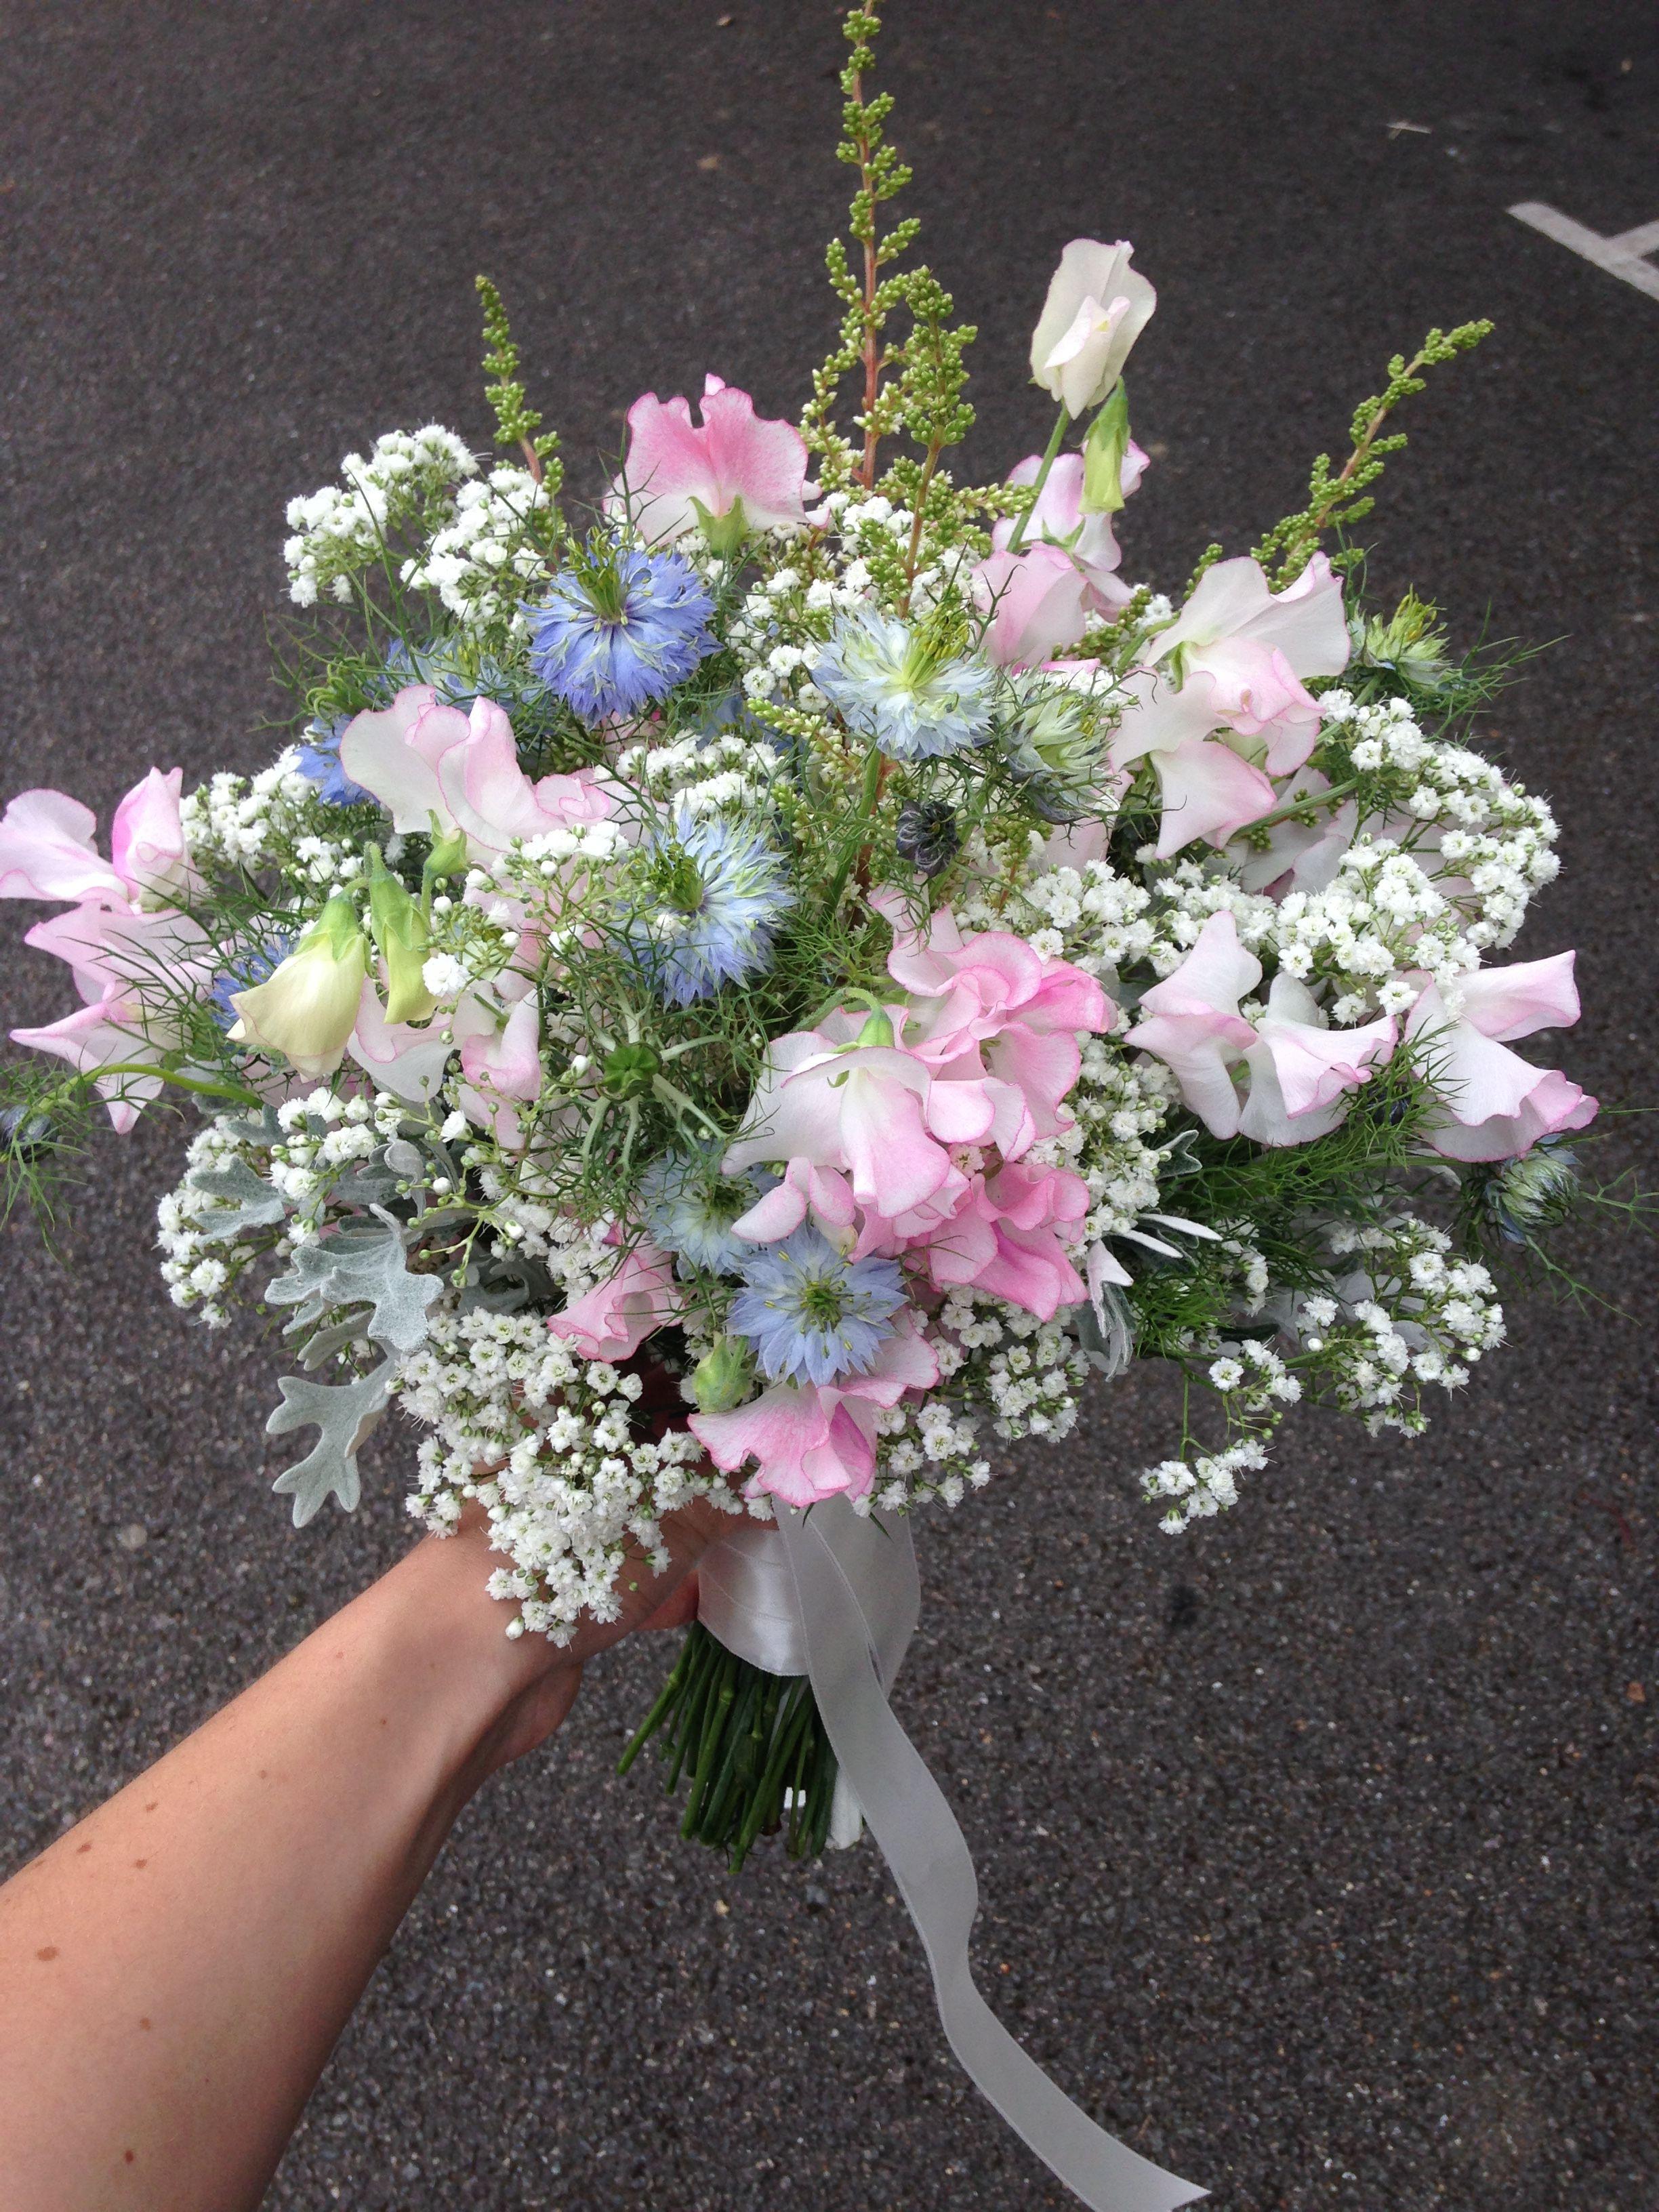 Rustic bouquet of Gypsophila Sweet Peas Astilbe and Nigella